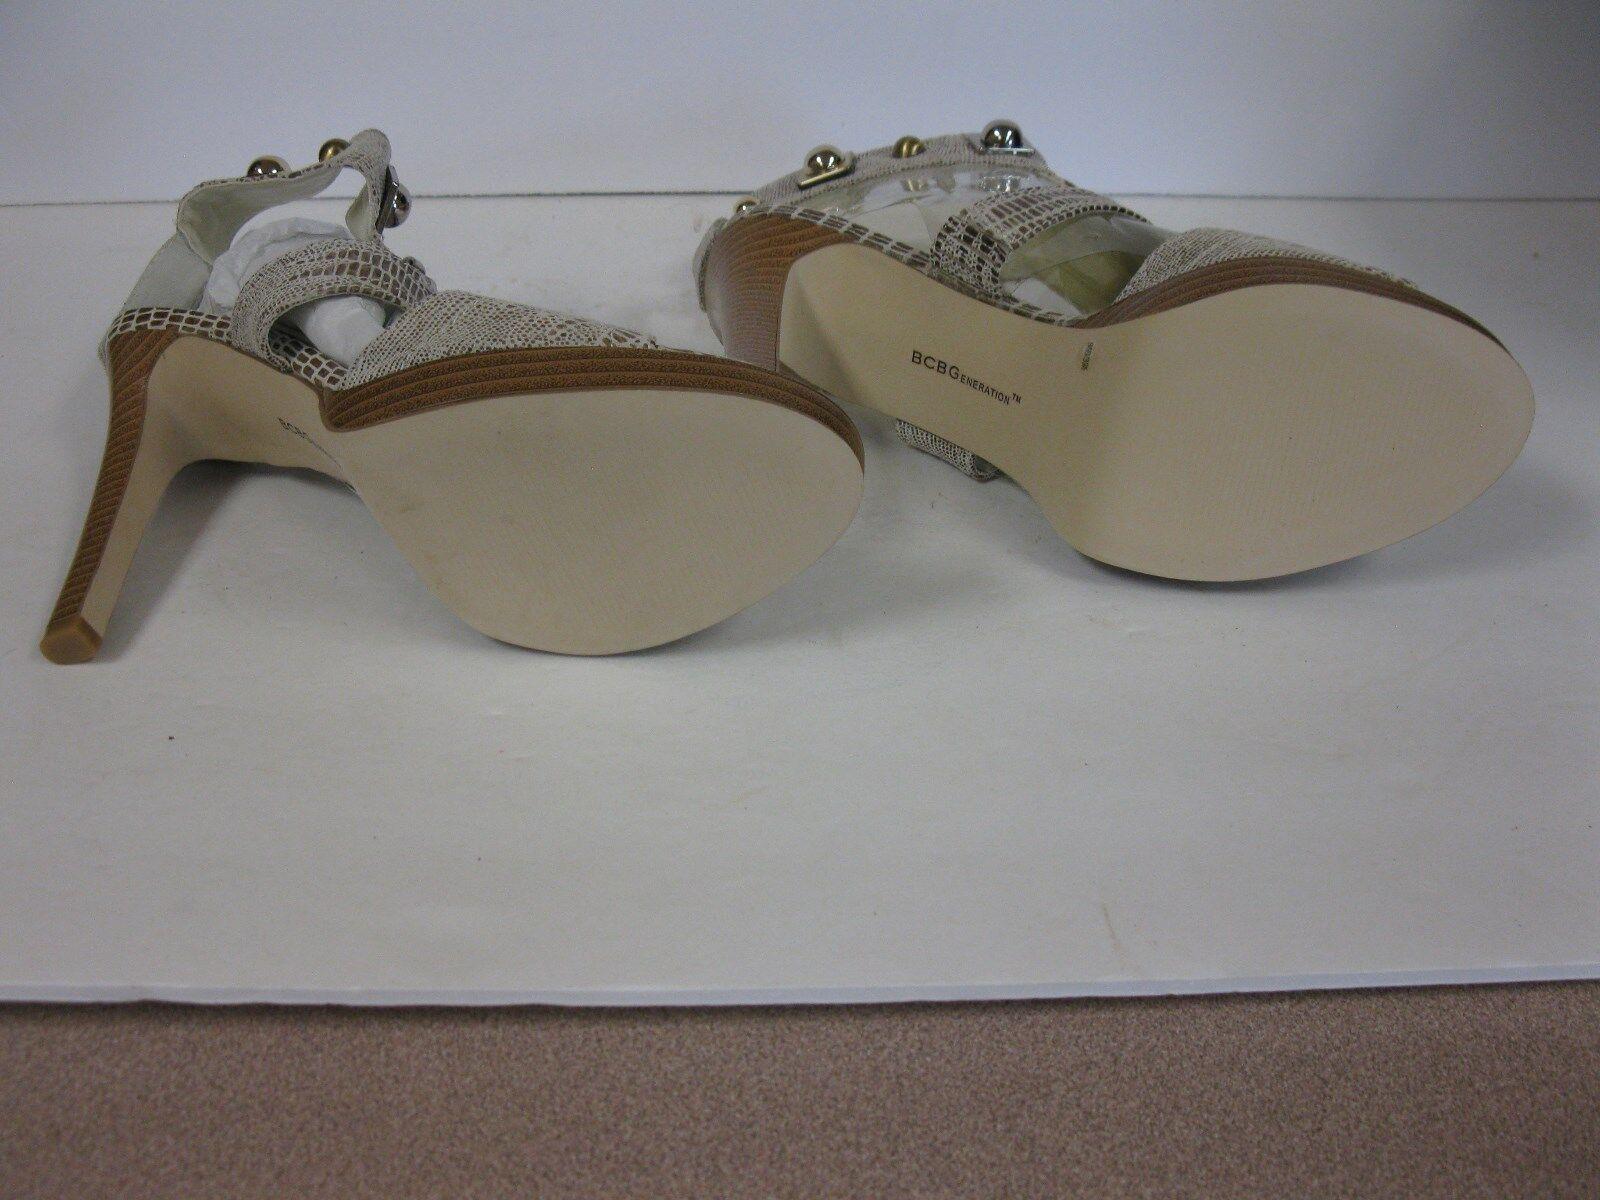 BCBGeneration Women's shoes Size 9.5M 9.5M 9.5M Taina High Heels Zipper 6a22cb